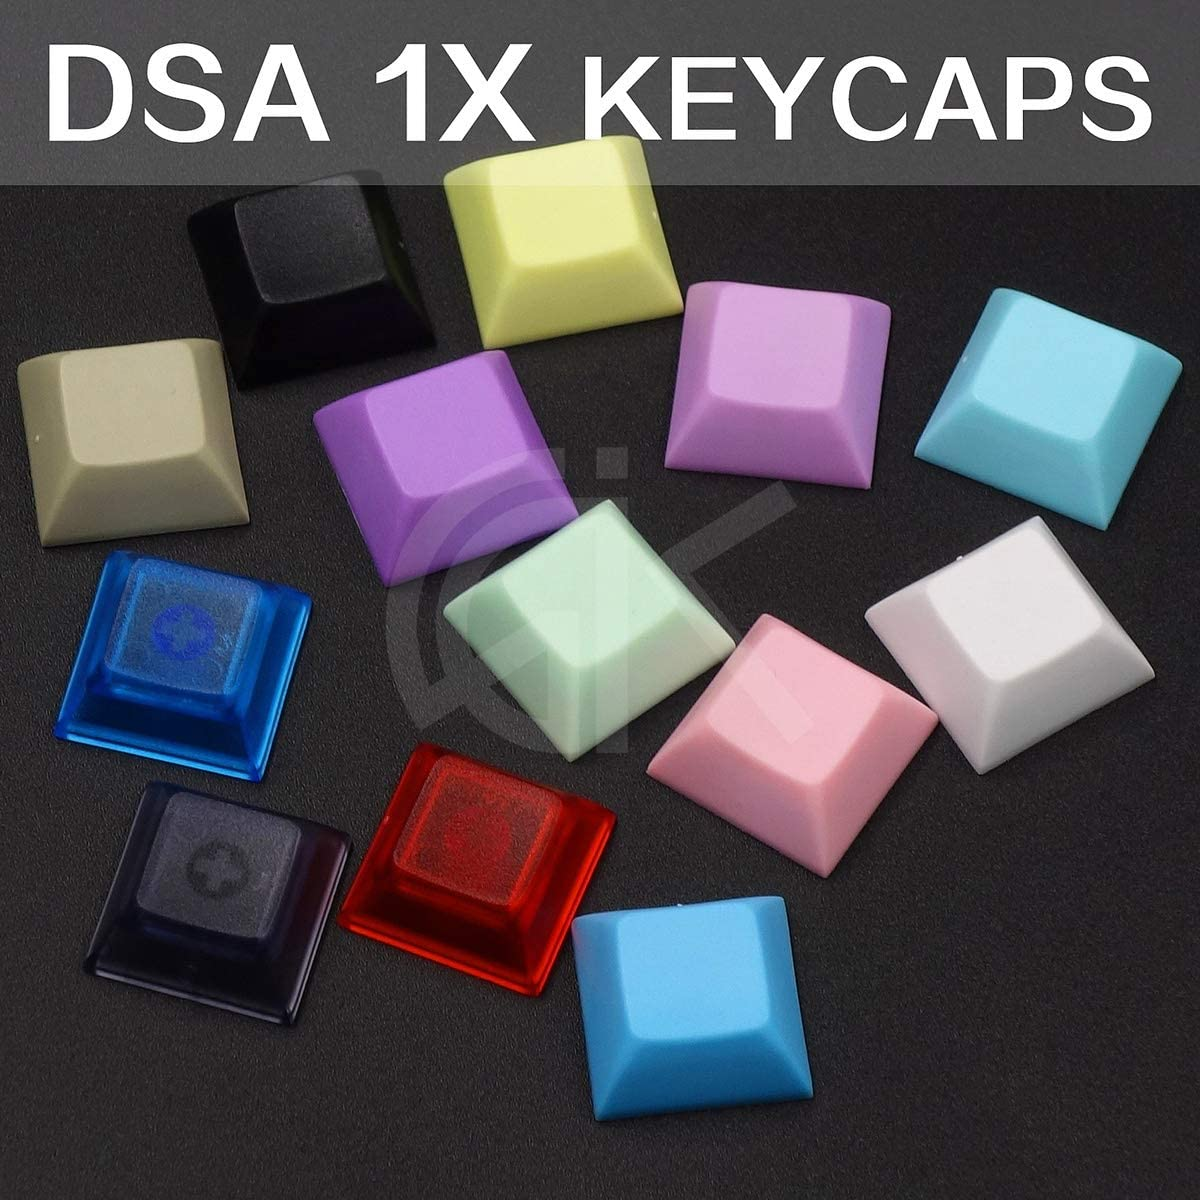 Colore : 10pcs Black Keyboard keycaps DSA 1x No Printed PBT Mechanical Keyboard Key Cap Cap Keycaps Nano Color Black White Gray